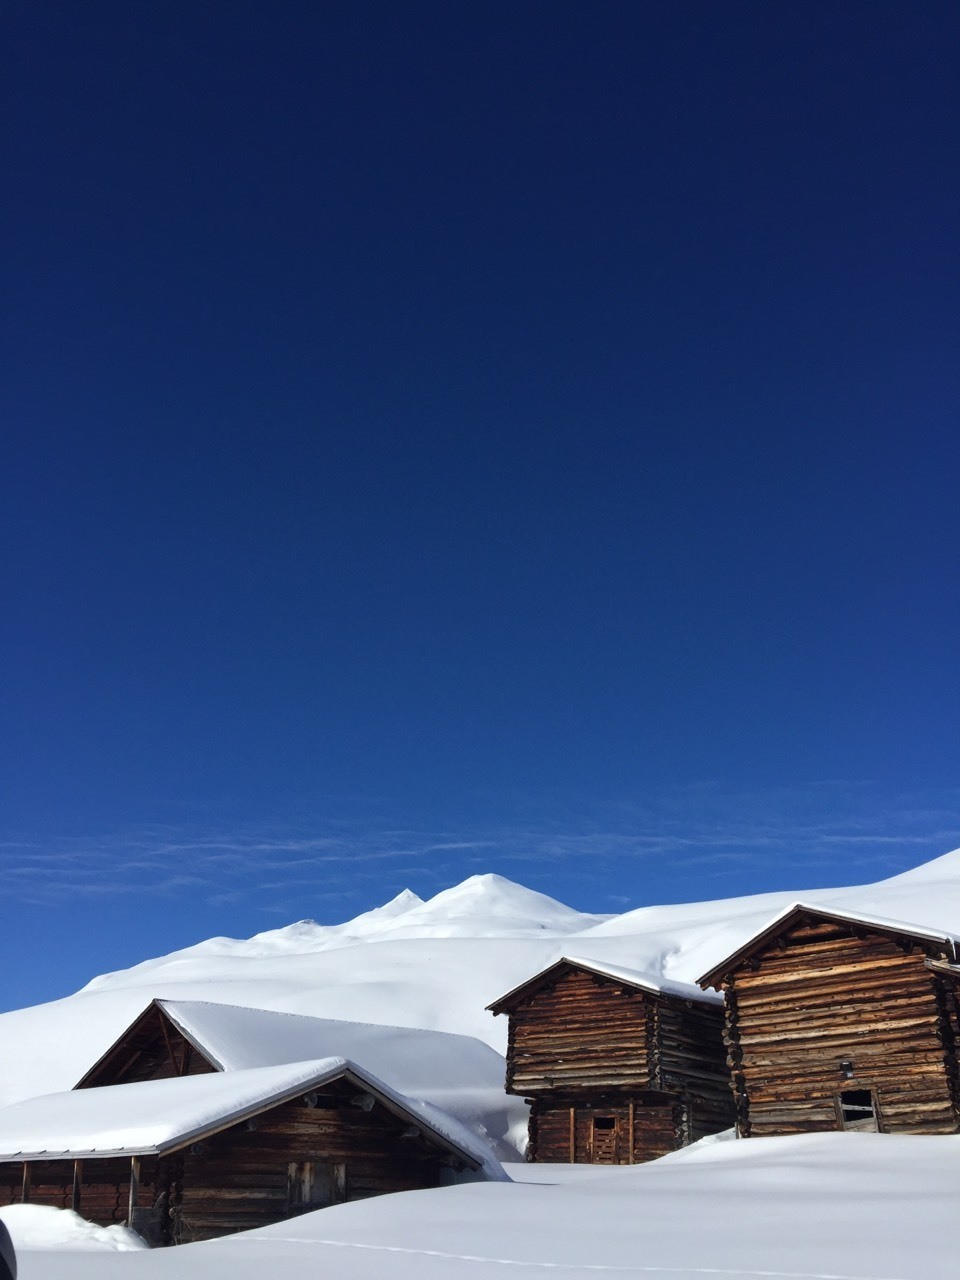 Swiss backcountry touring next to farmhouses.